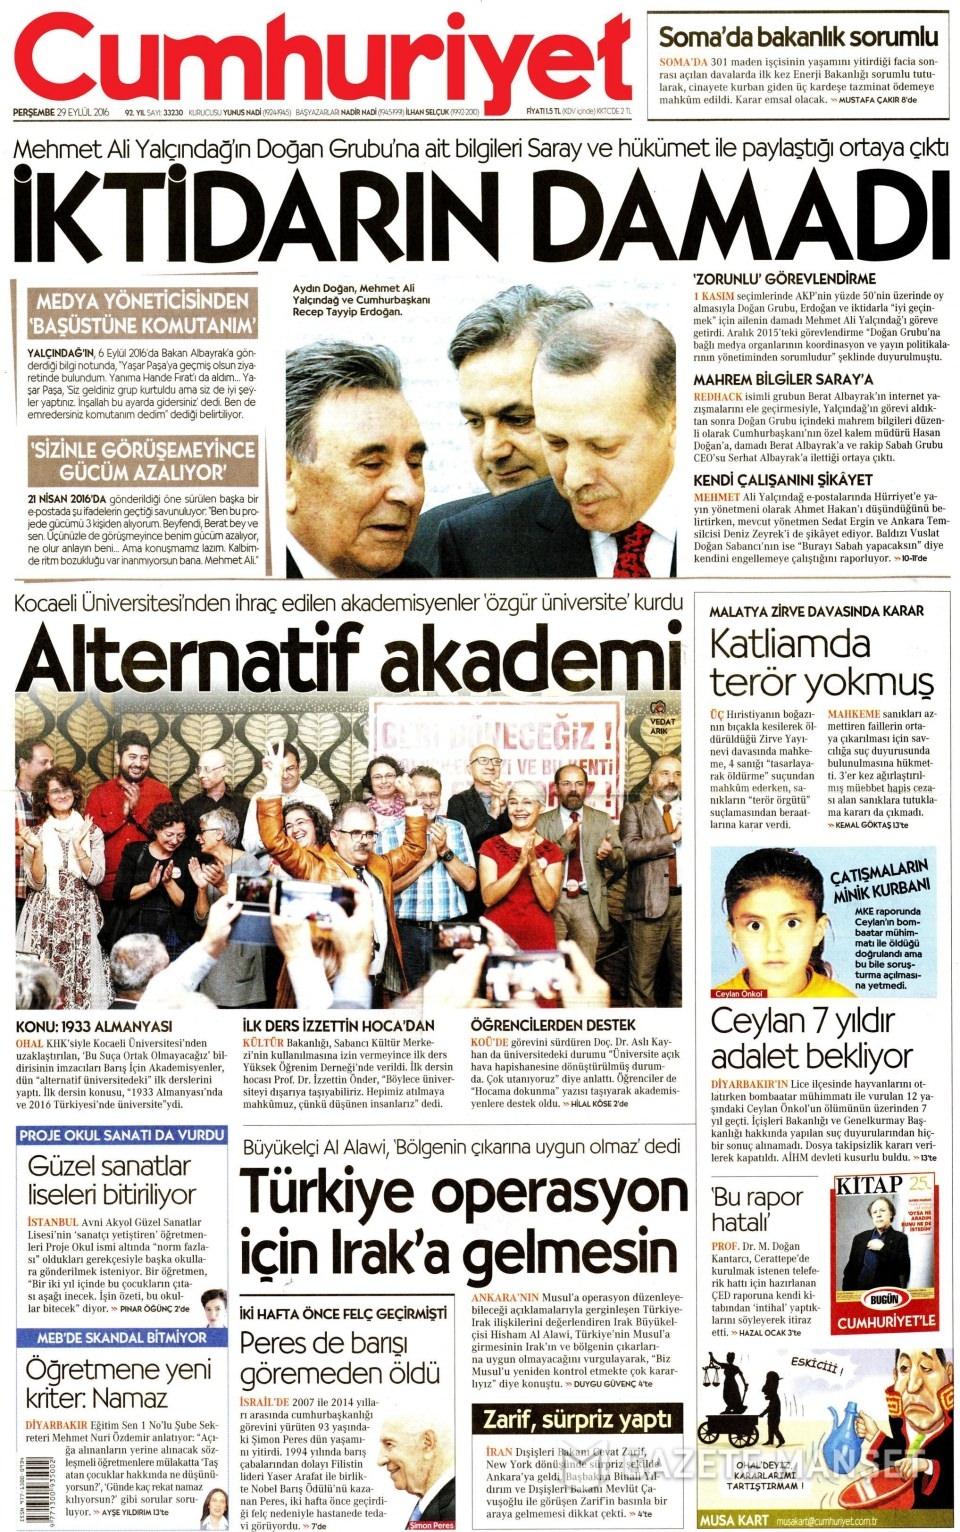 29 Eylül Perşembe gazete manşetleri 8